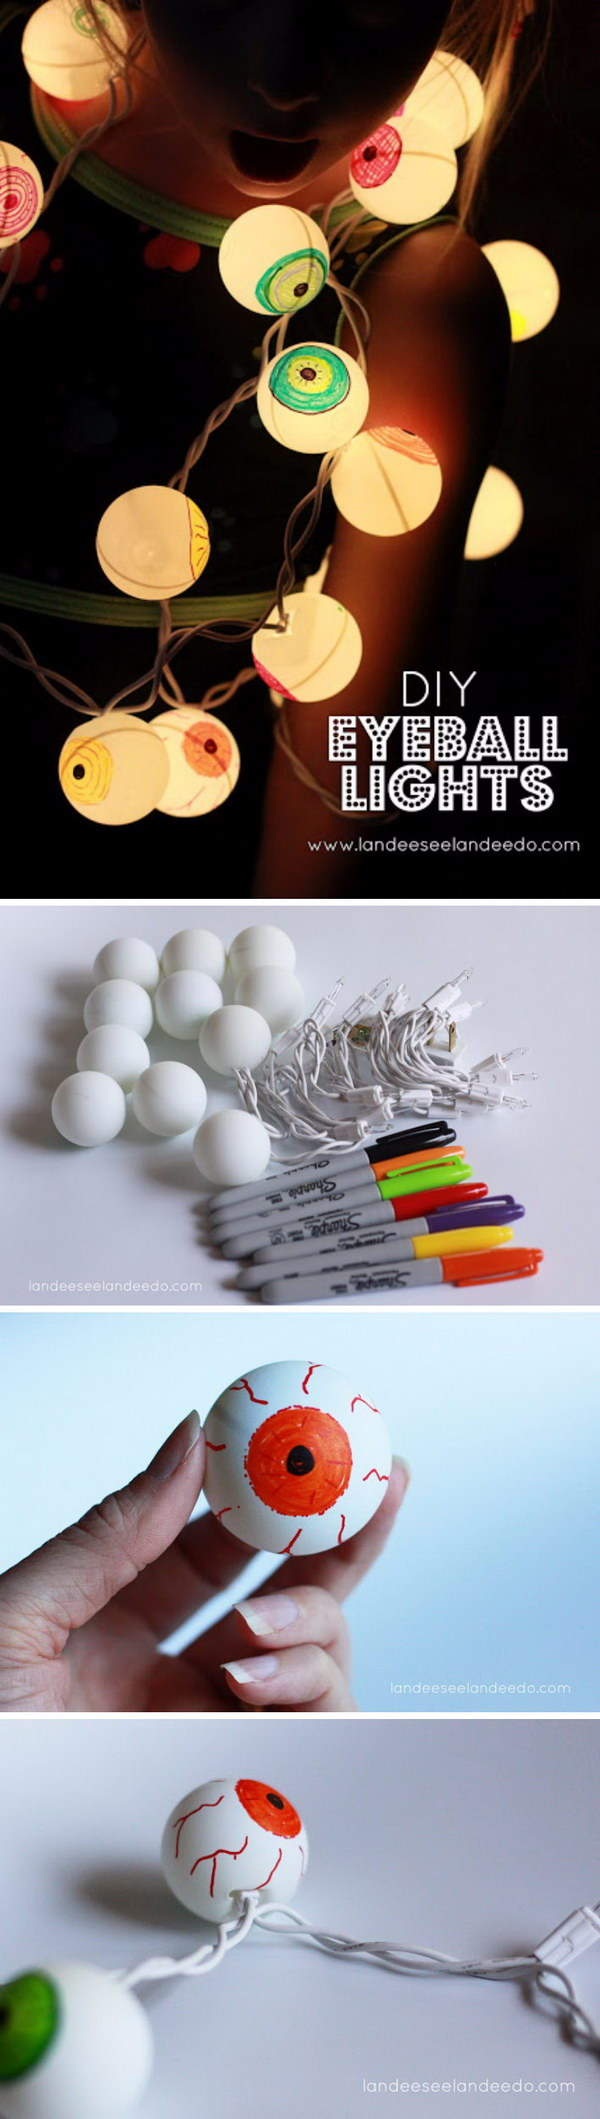 6. DIY Eyeball Lights